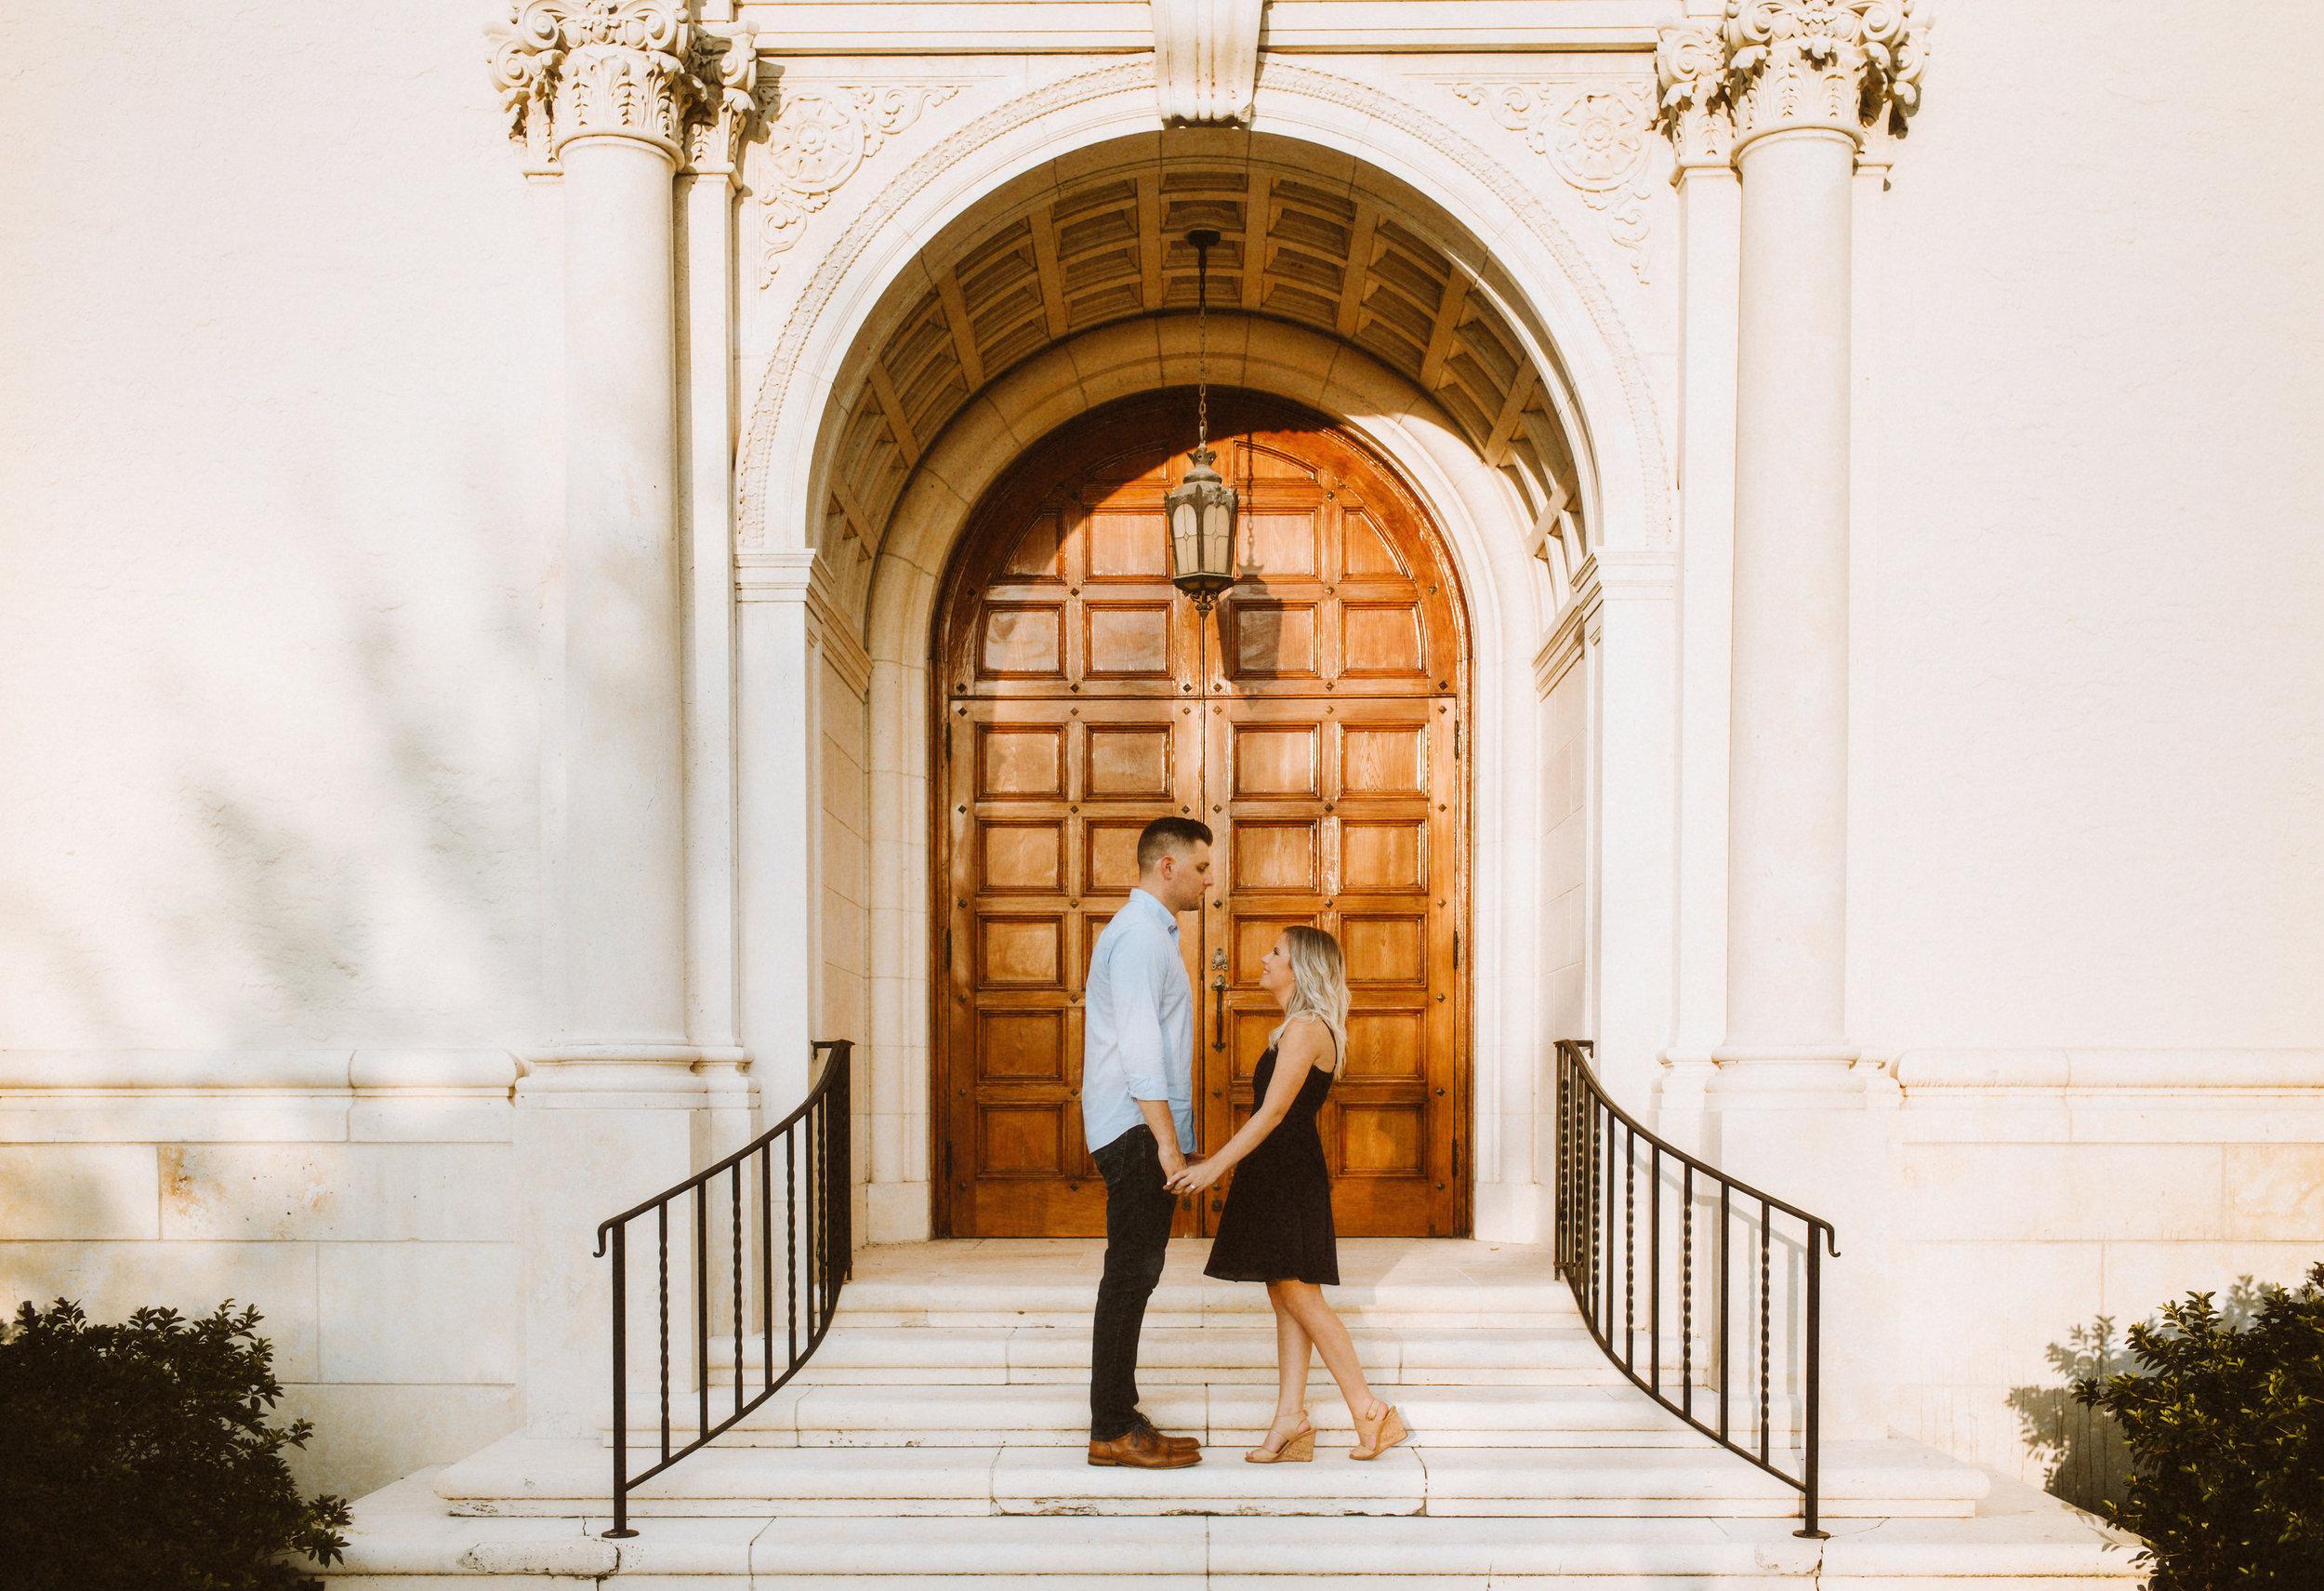 Engagement | Vanessa Boy Photography | vanessaboy.com |-53-2.com |final .jpg